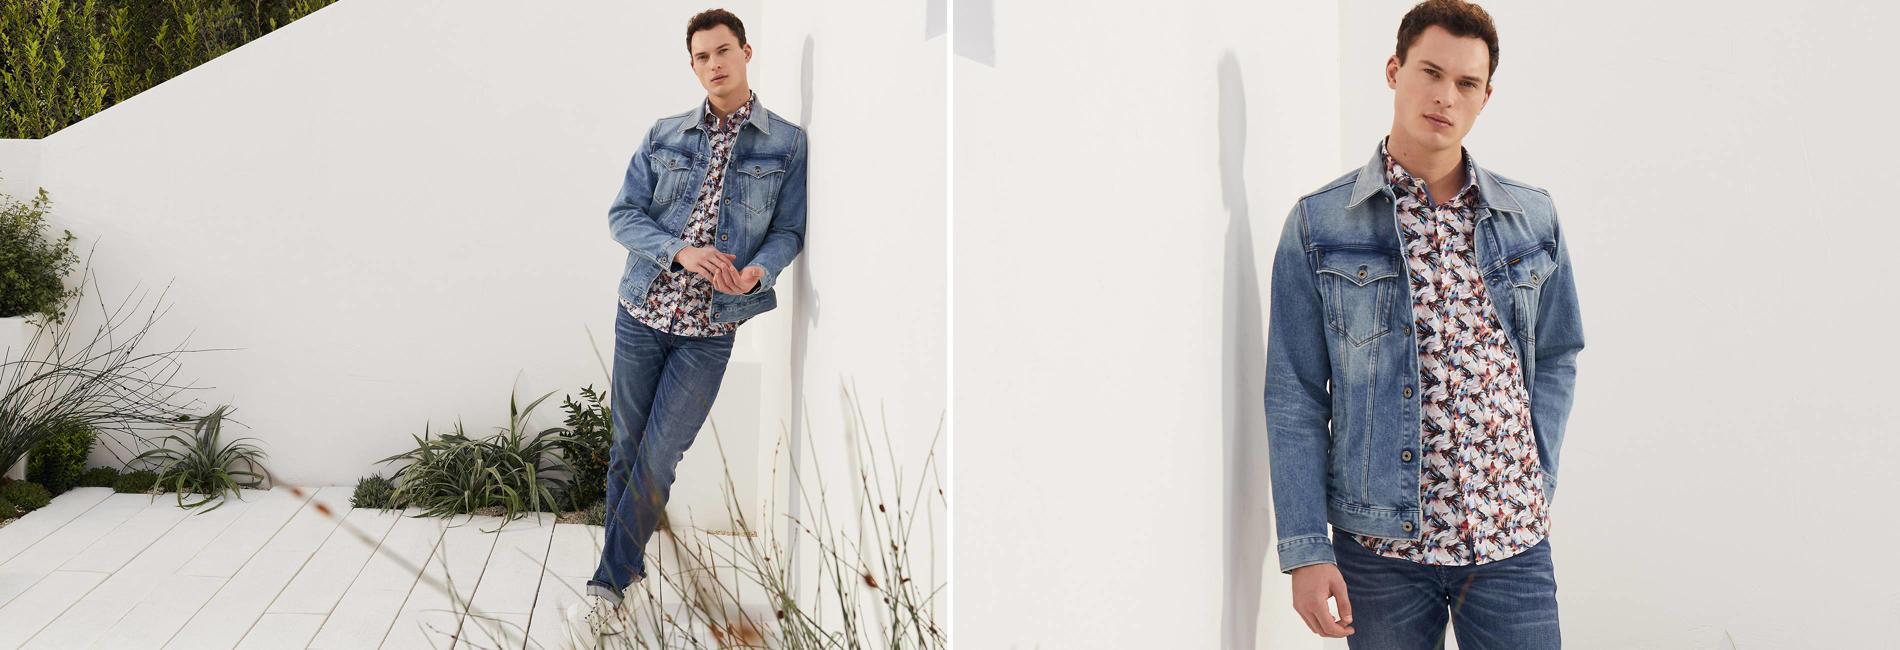 Heren topteaser week 18 jeans